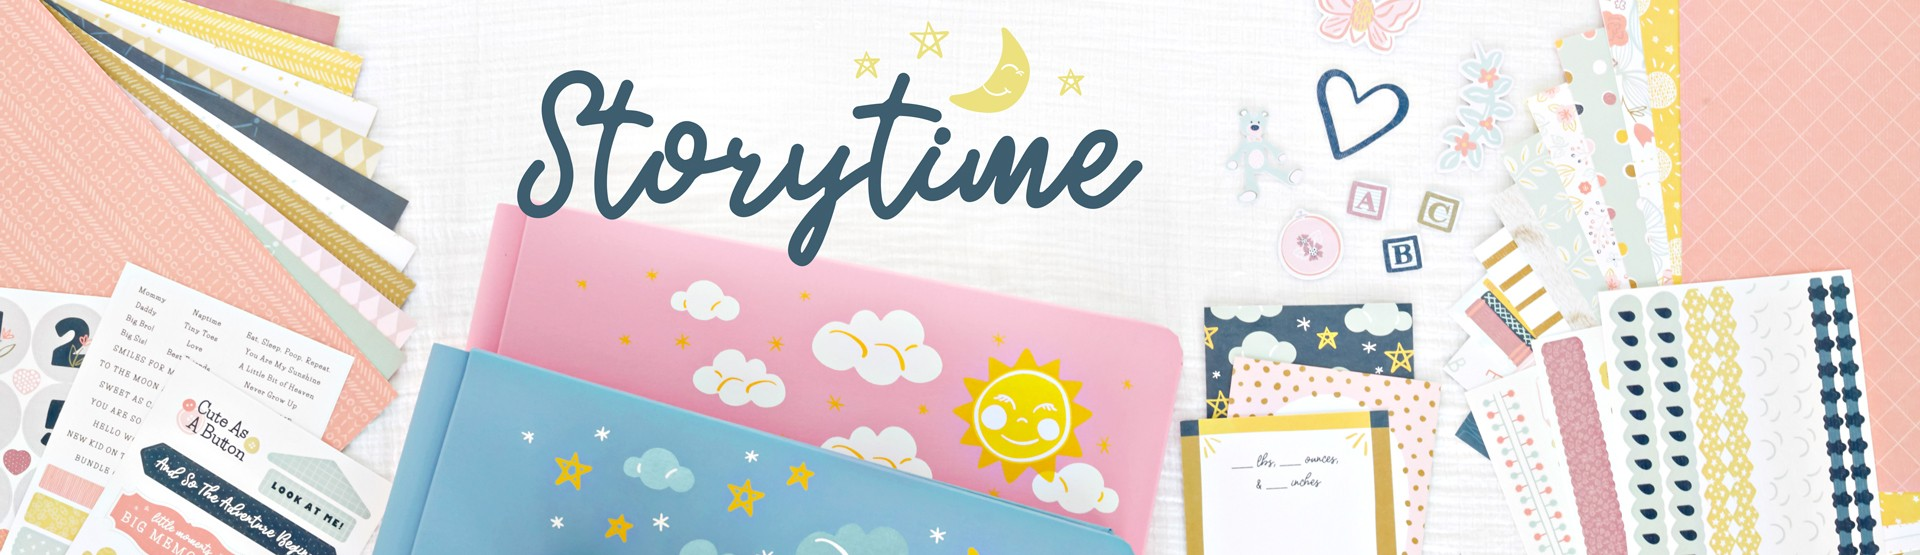 Baby & Kids: Storytime